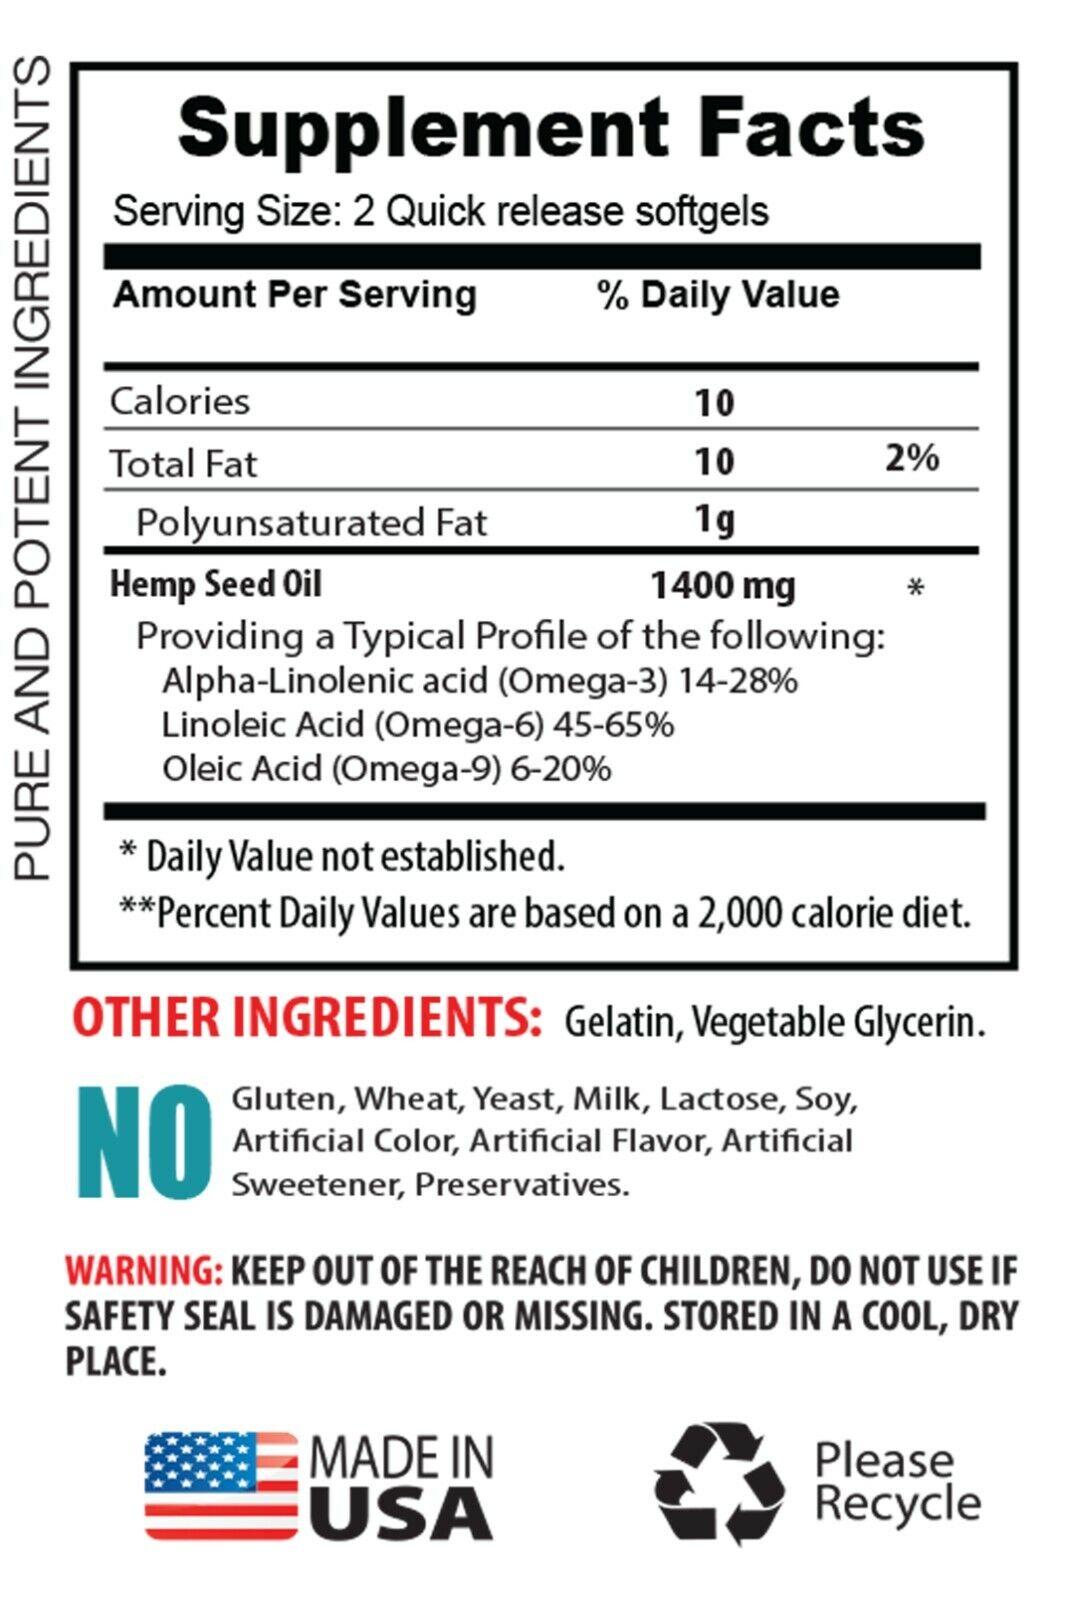 essential fatty acid, ORGANIC HEMP SEED OIL 1400mg, linoleic acid omega 6 1B 9